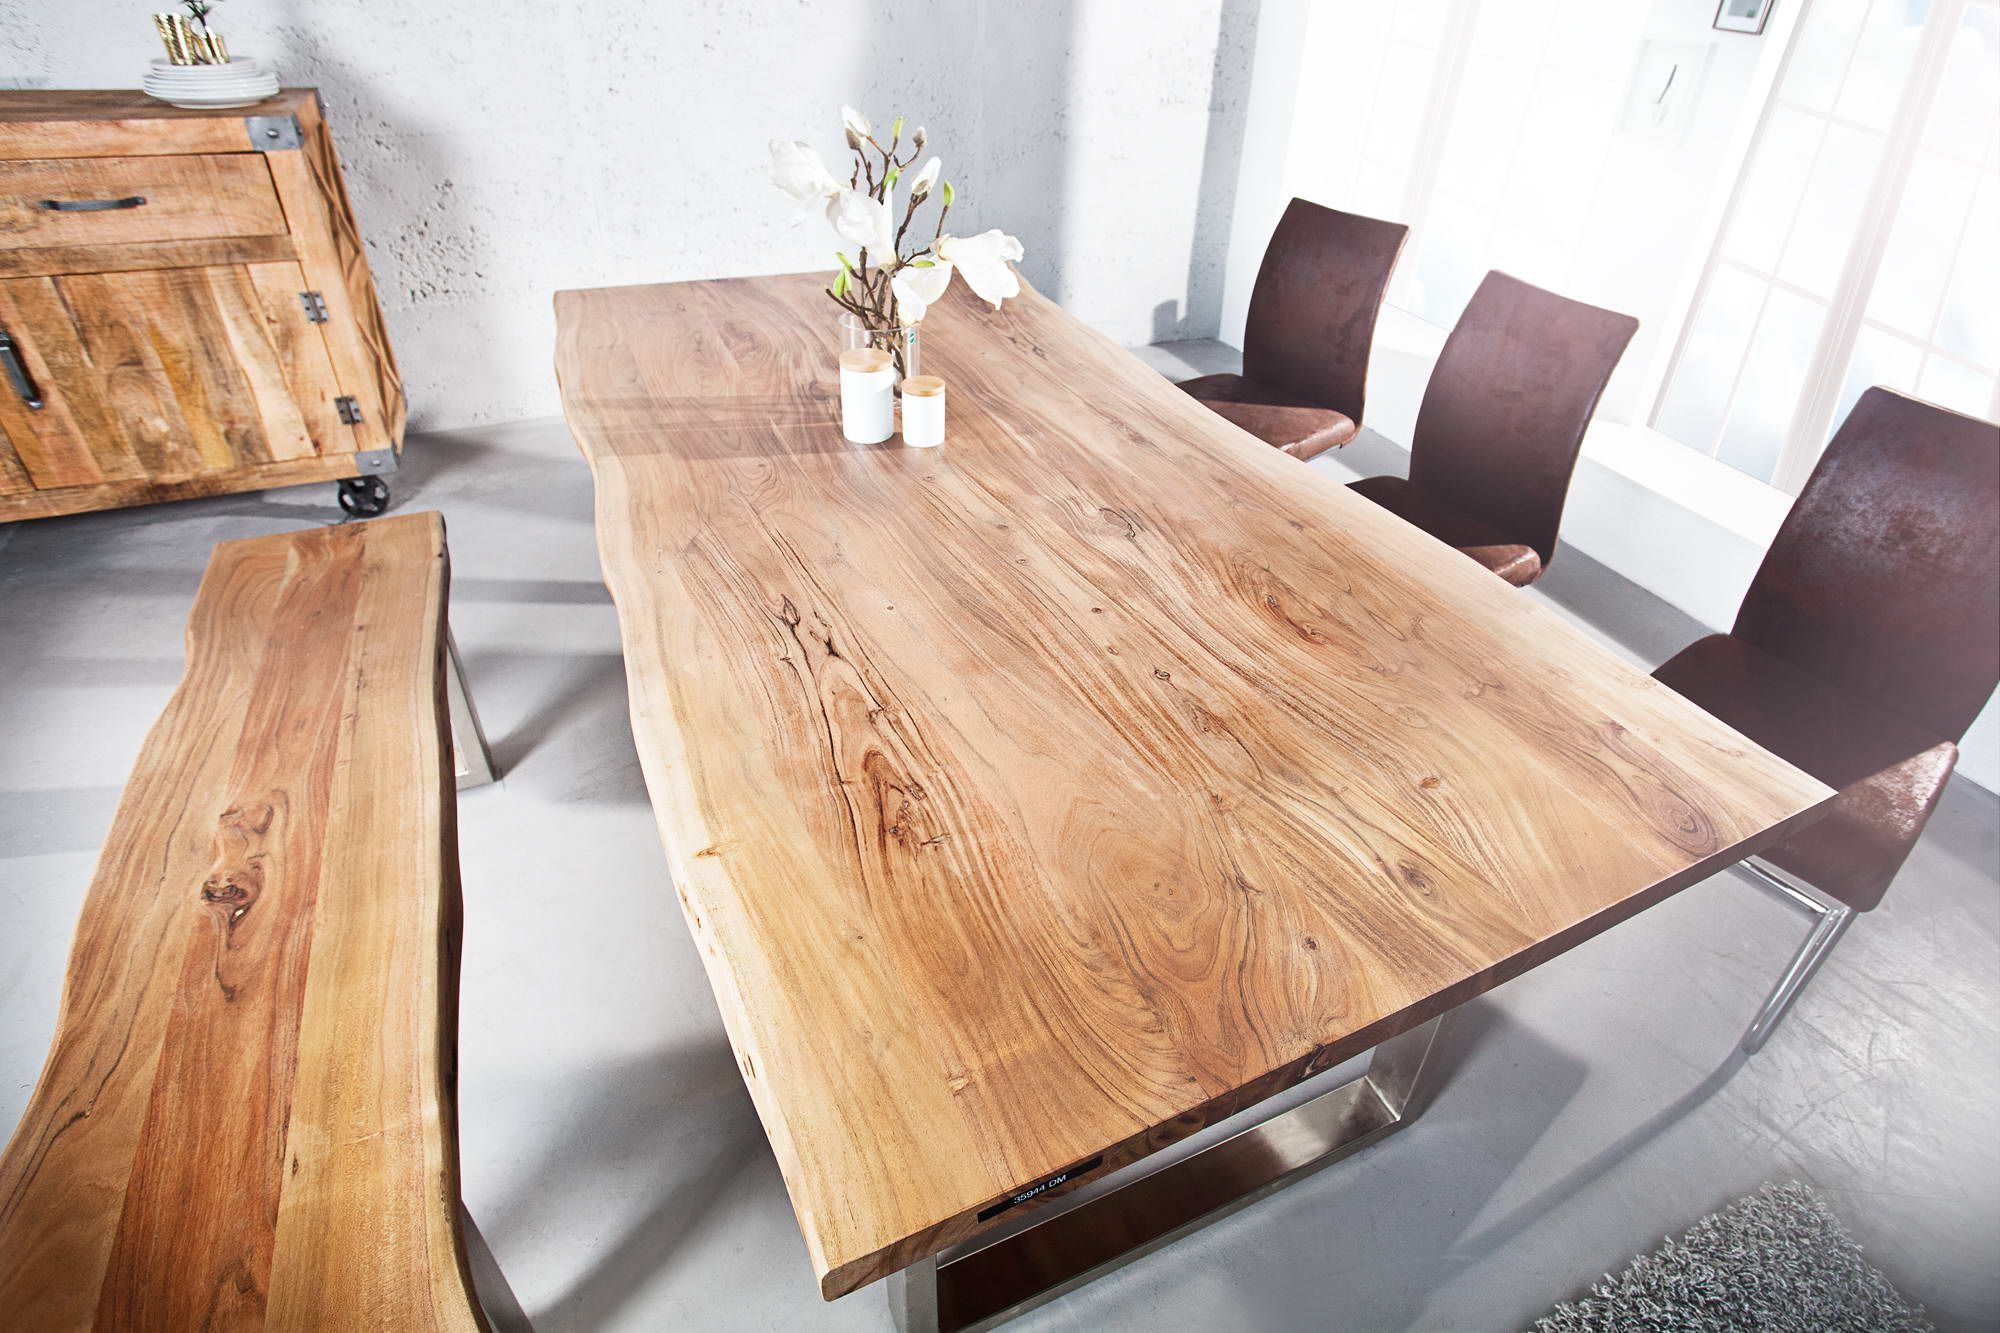 Luxusný Jedálenský Stôl Z Masívu Massive 160cm Dining Table Solid Wood Dining Table Tree Trunk Table